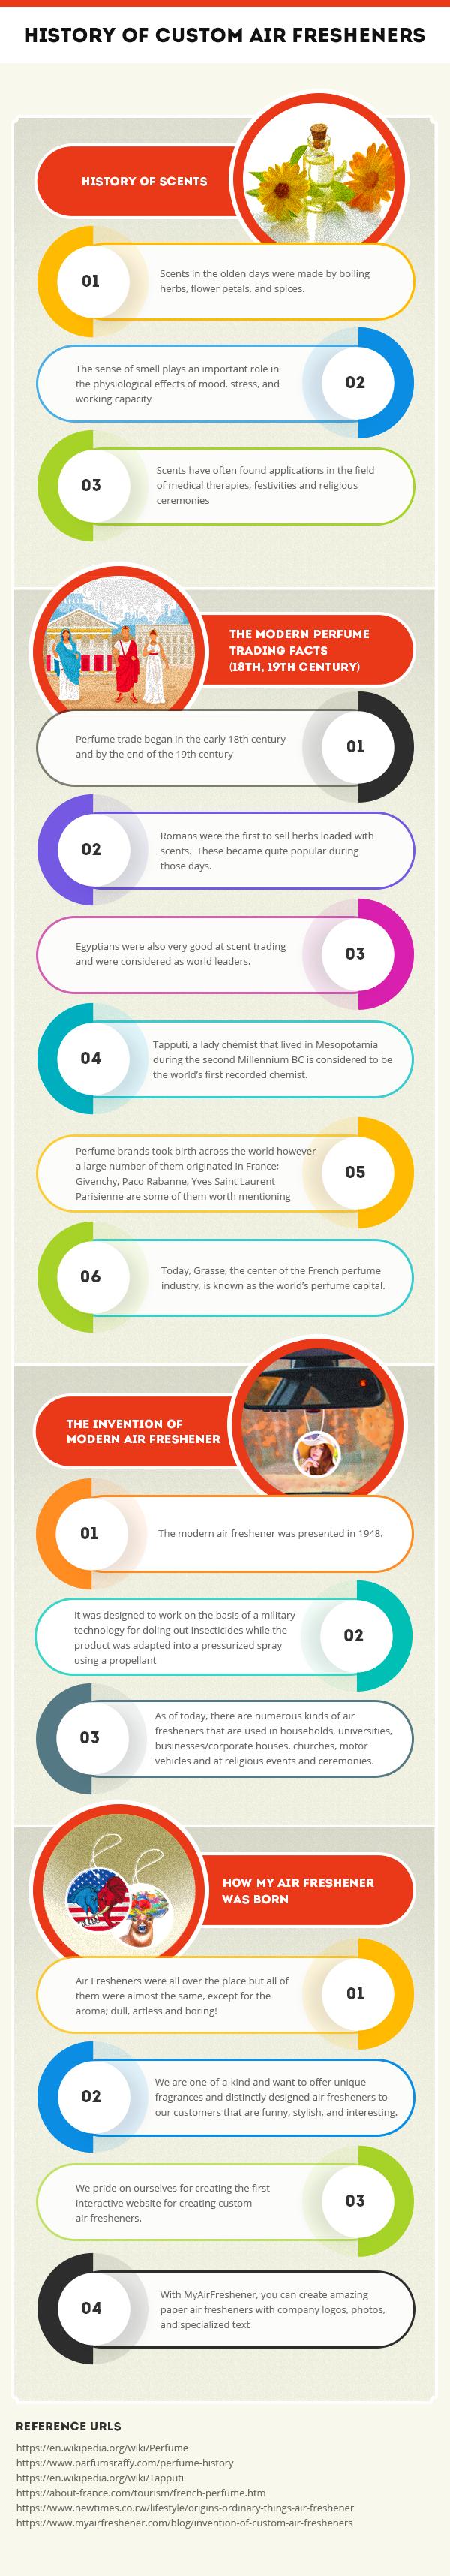 history of custom air fresheners Infographic